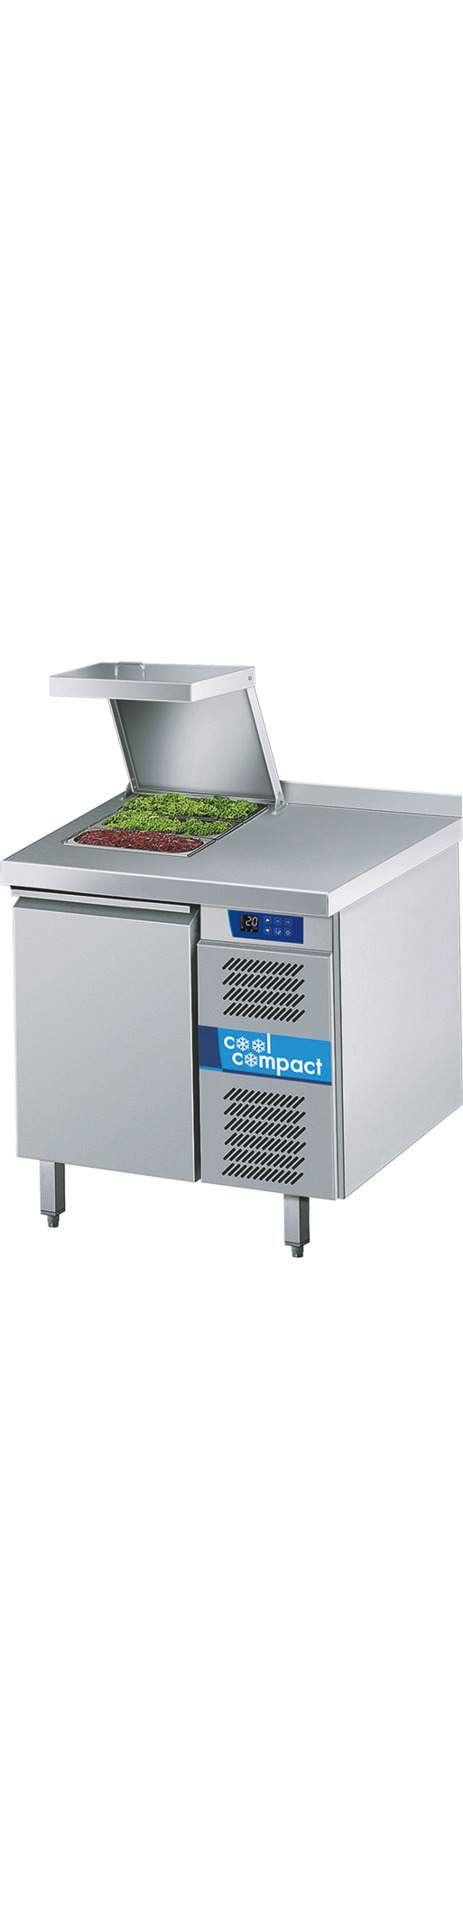 Saladette 1 Tür je 10 x GN 1/1 /  ohne Tischplatte / zentralgekühlt